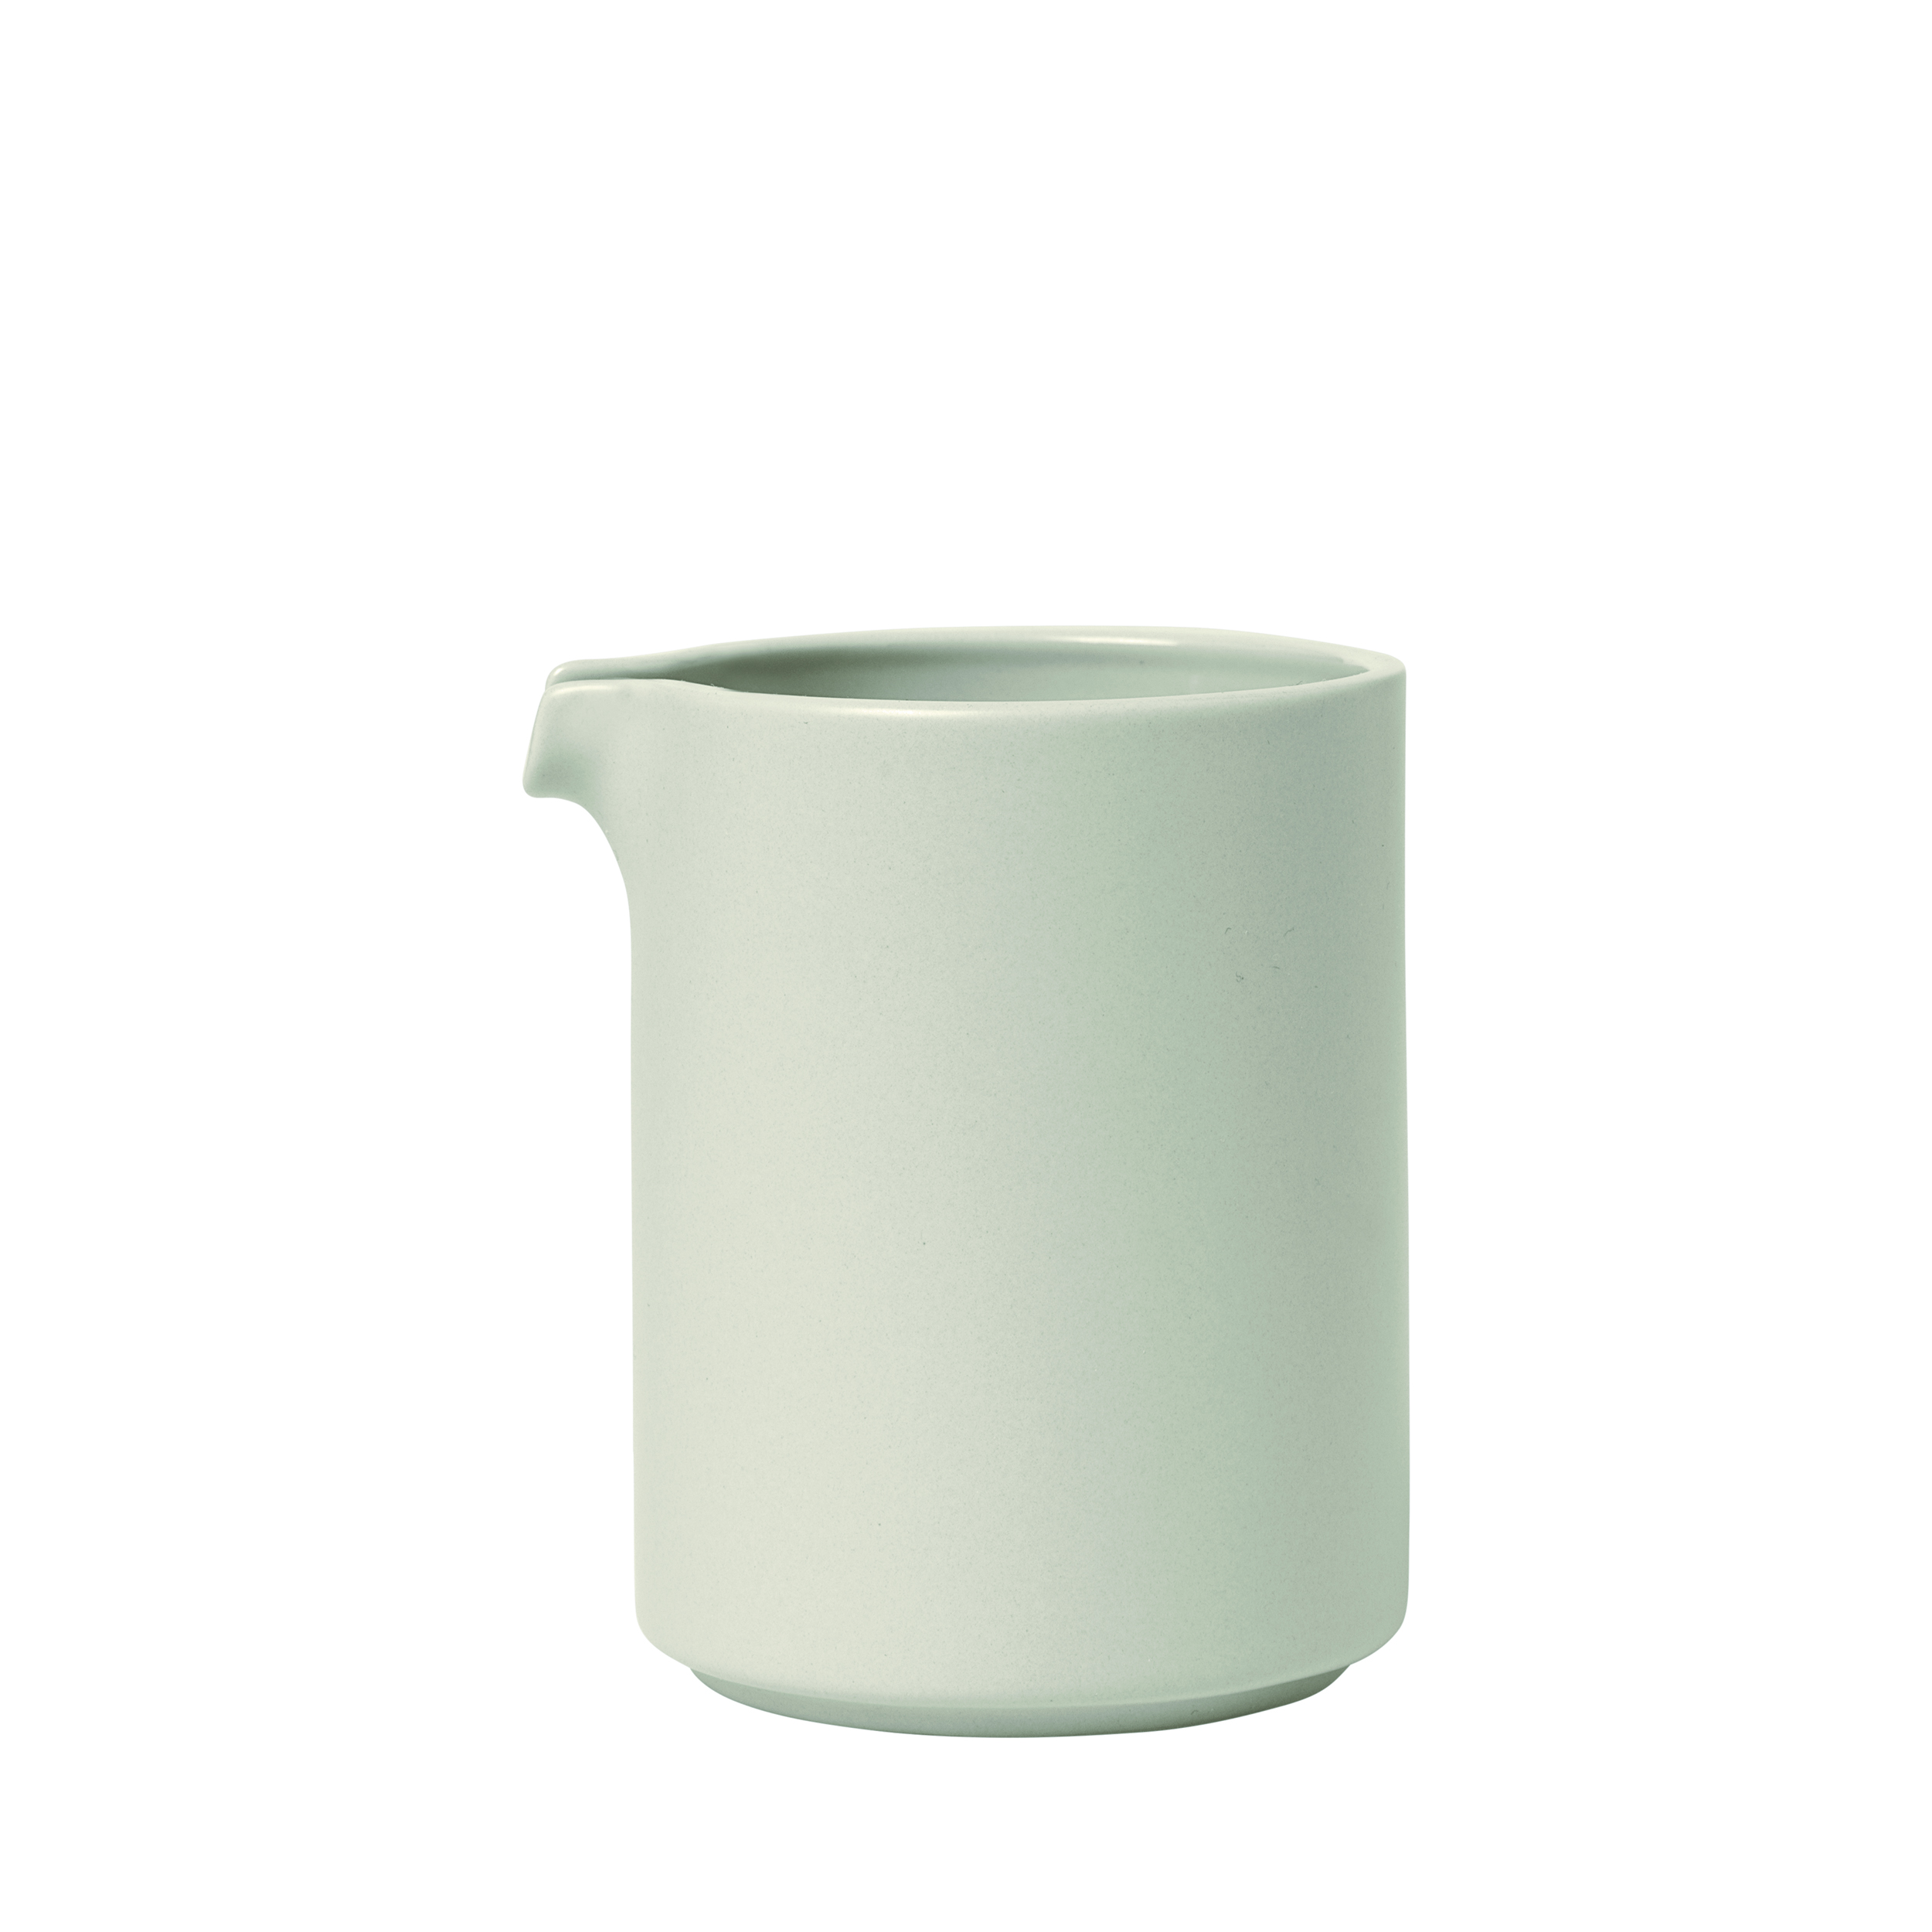 Mlékovka PILAR, krémová - Blomus